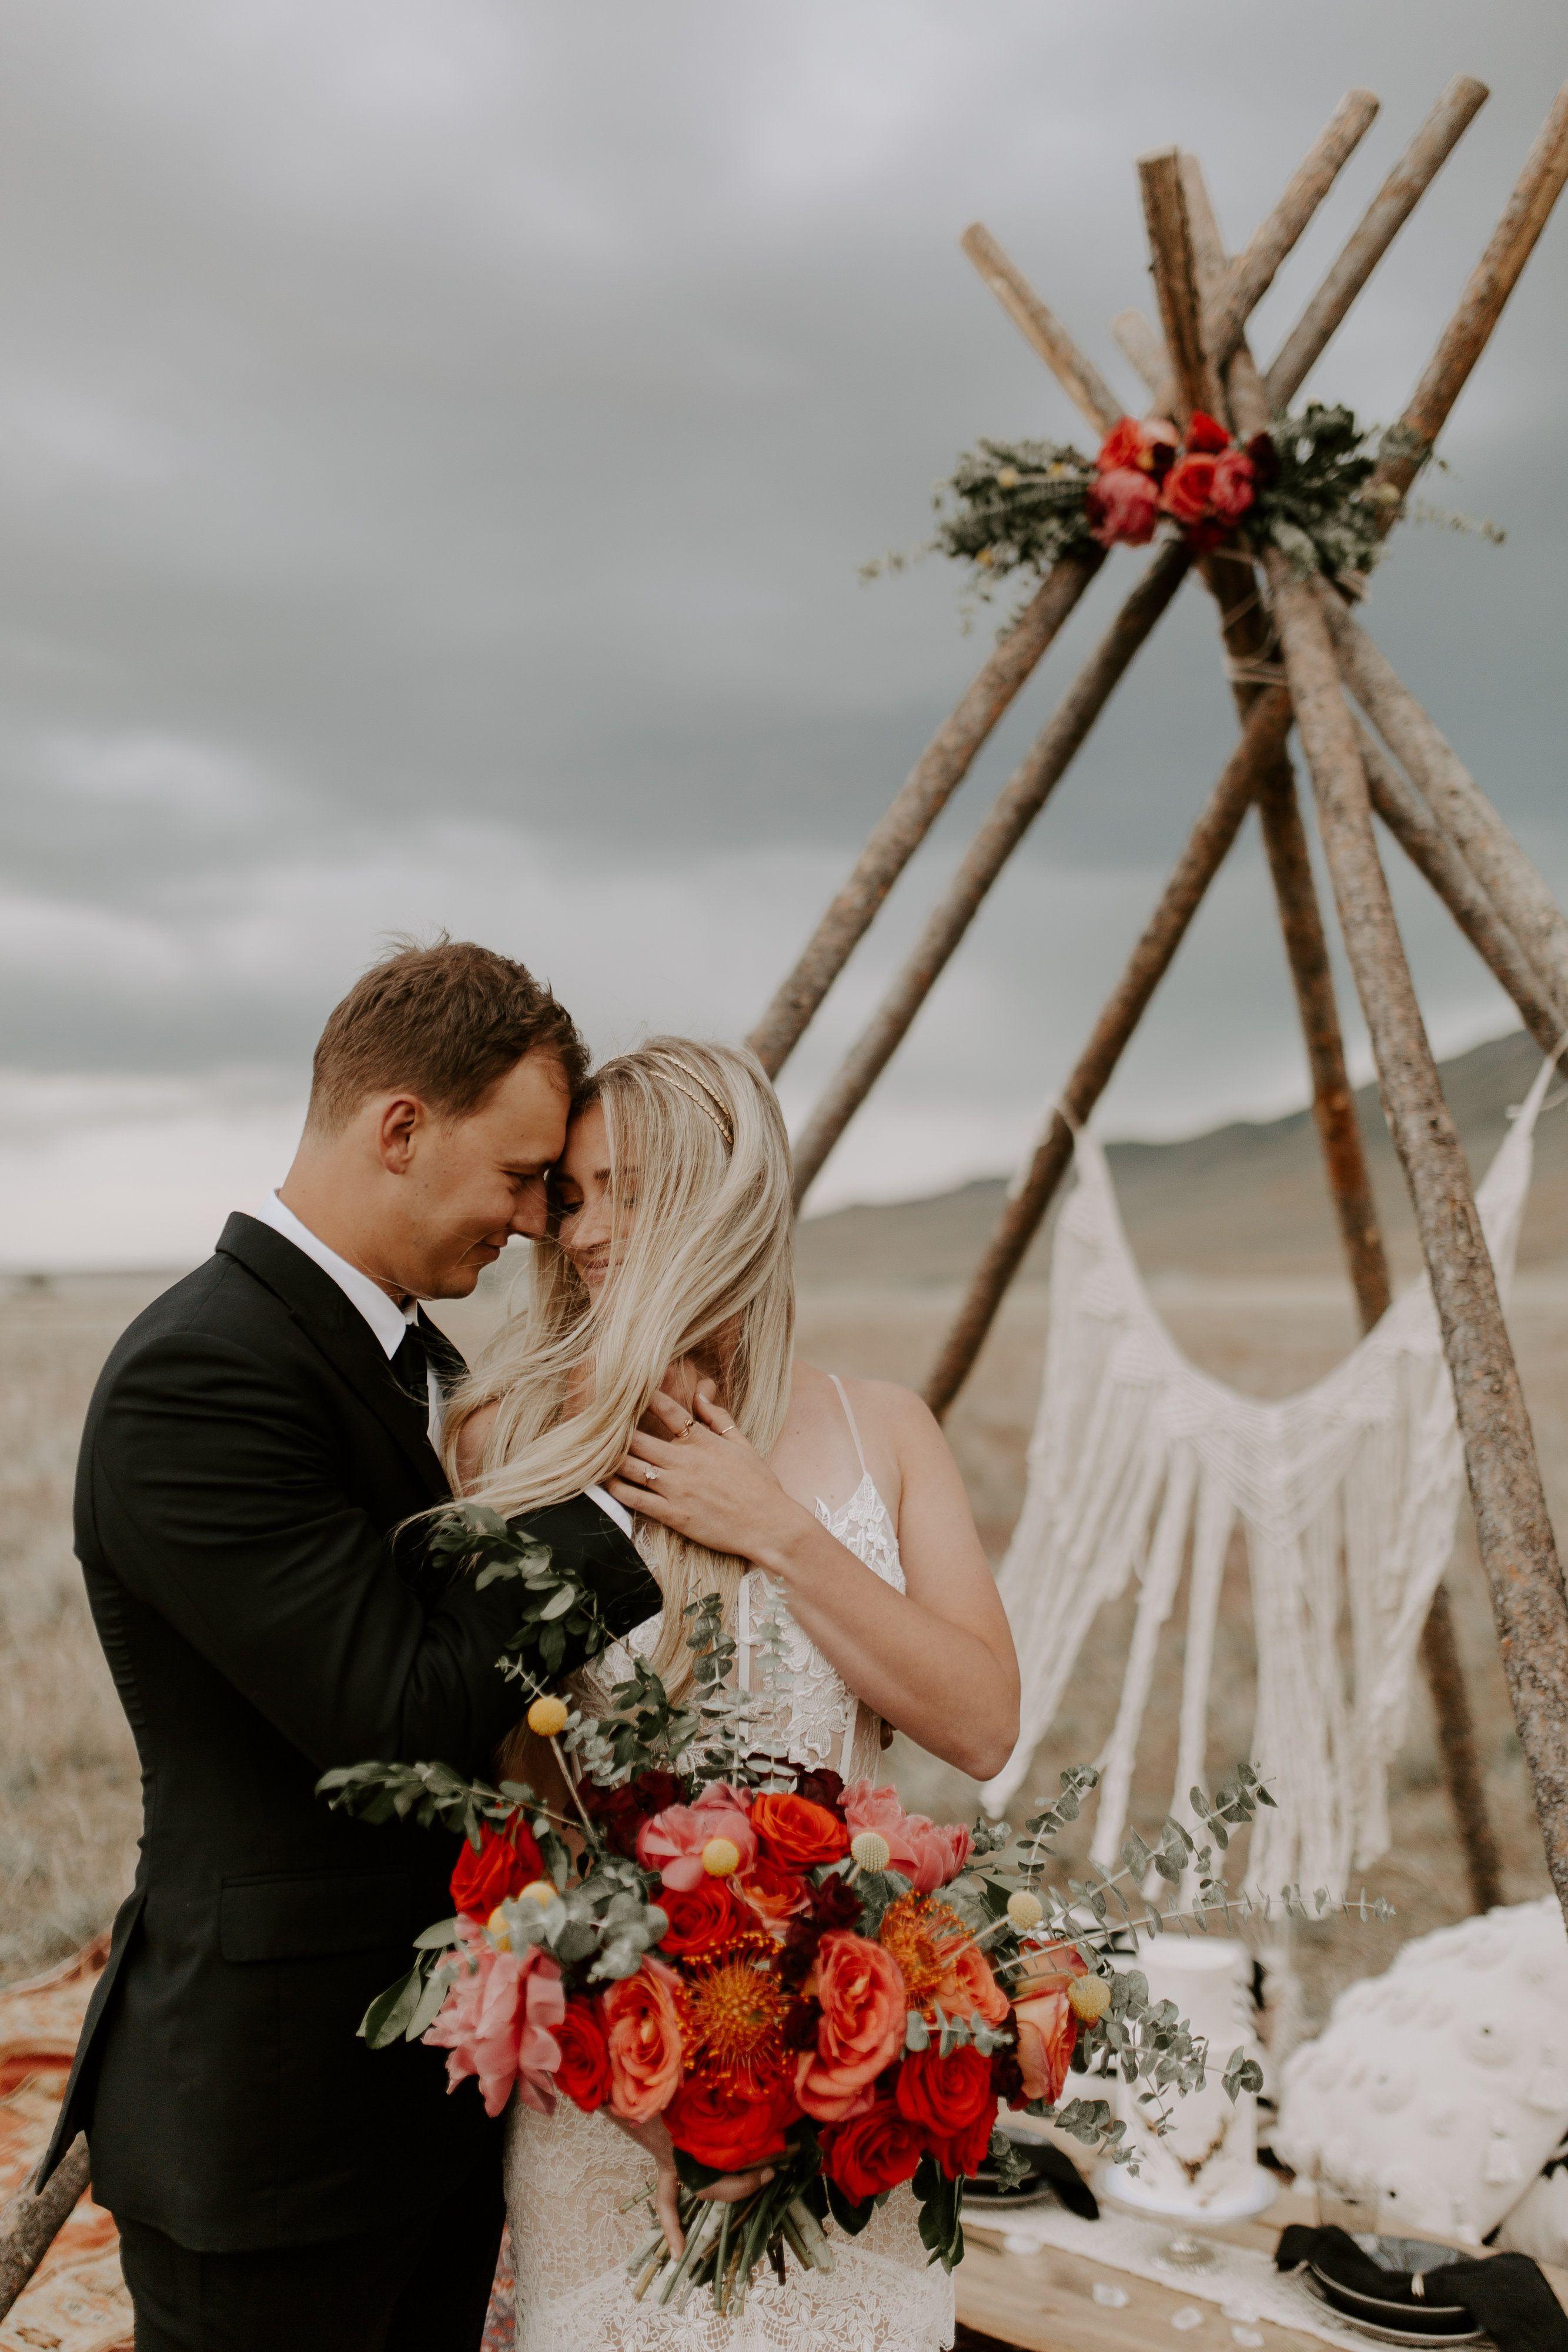 Wedding Rentals Utah | Boho Bridals Antelope Island Vintage Rentals Boho Wedding Boho